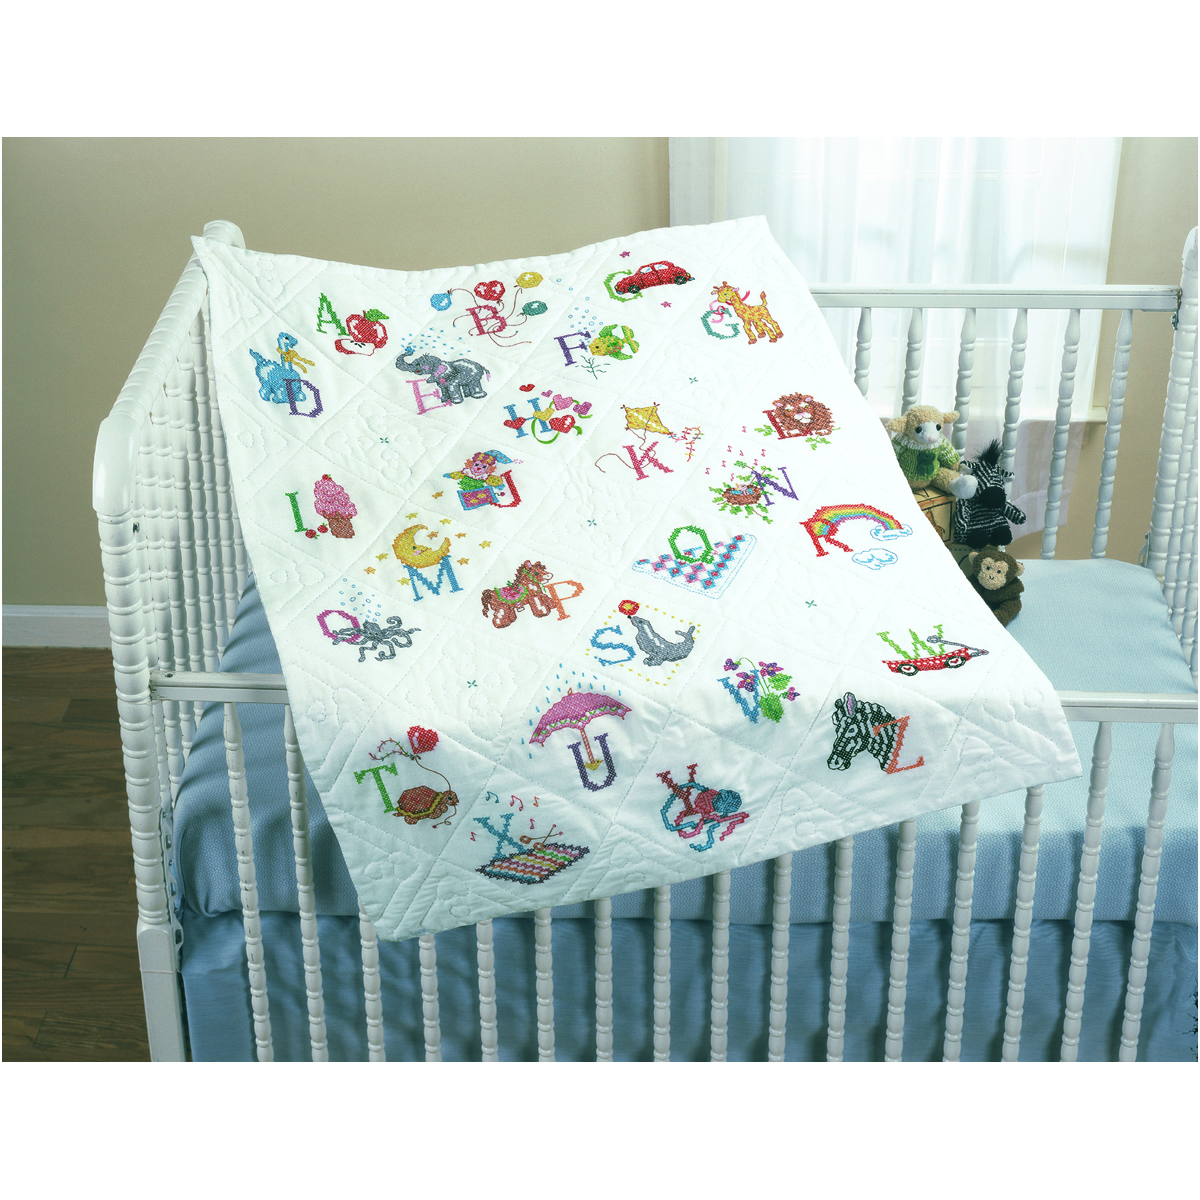 Bucilla ® Baby - Stamped Cross Stitch - Crib Ensembles - Alphabet Dreams - Quilt Top - 43241